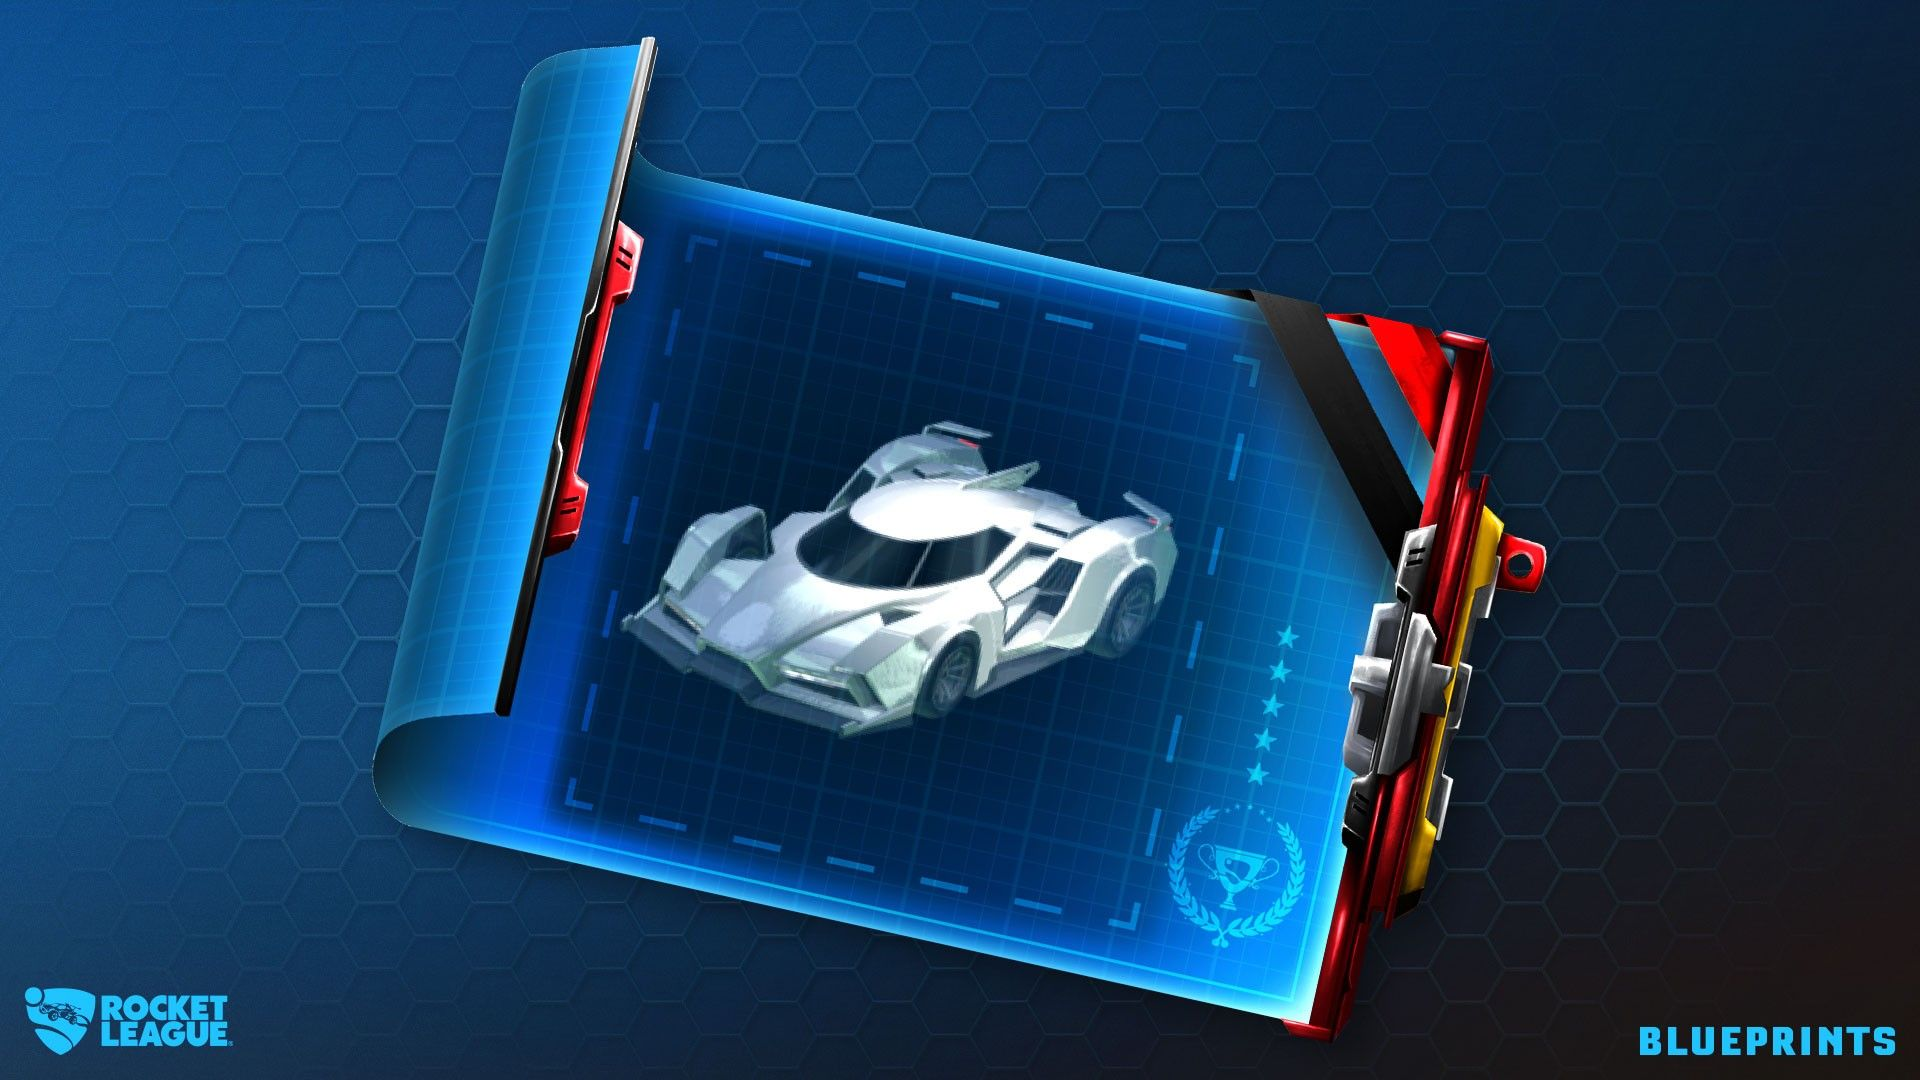 Blueprints And Final Crate Revealed Rocket League Official Site